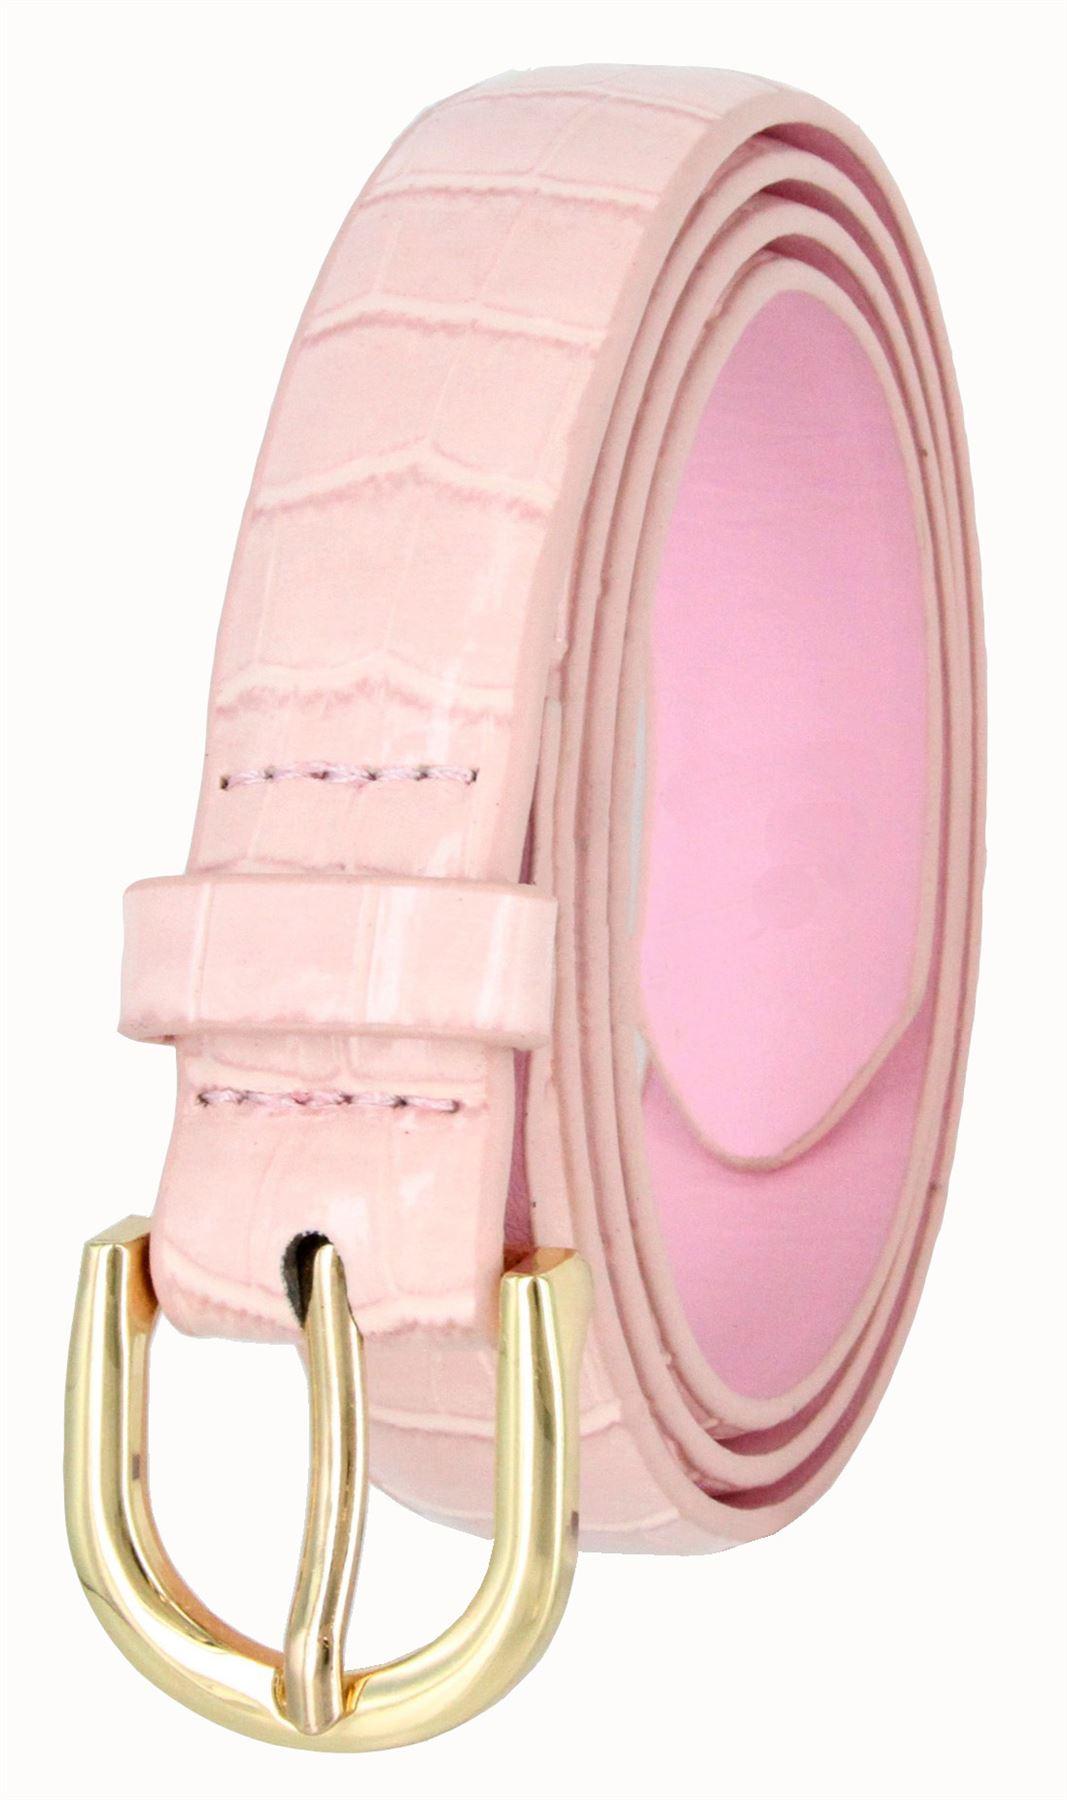 Women-039-s-Skinny-Thin-Alligator-Embossed-Genuine-Leather-Belt-1-034-25mm-Wide thumbnail 16